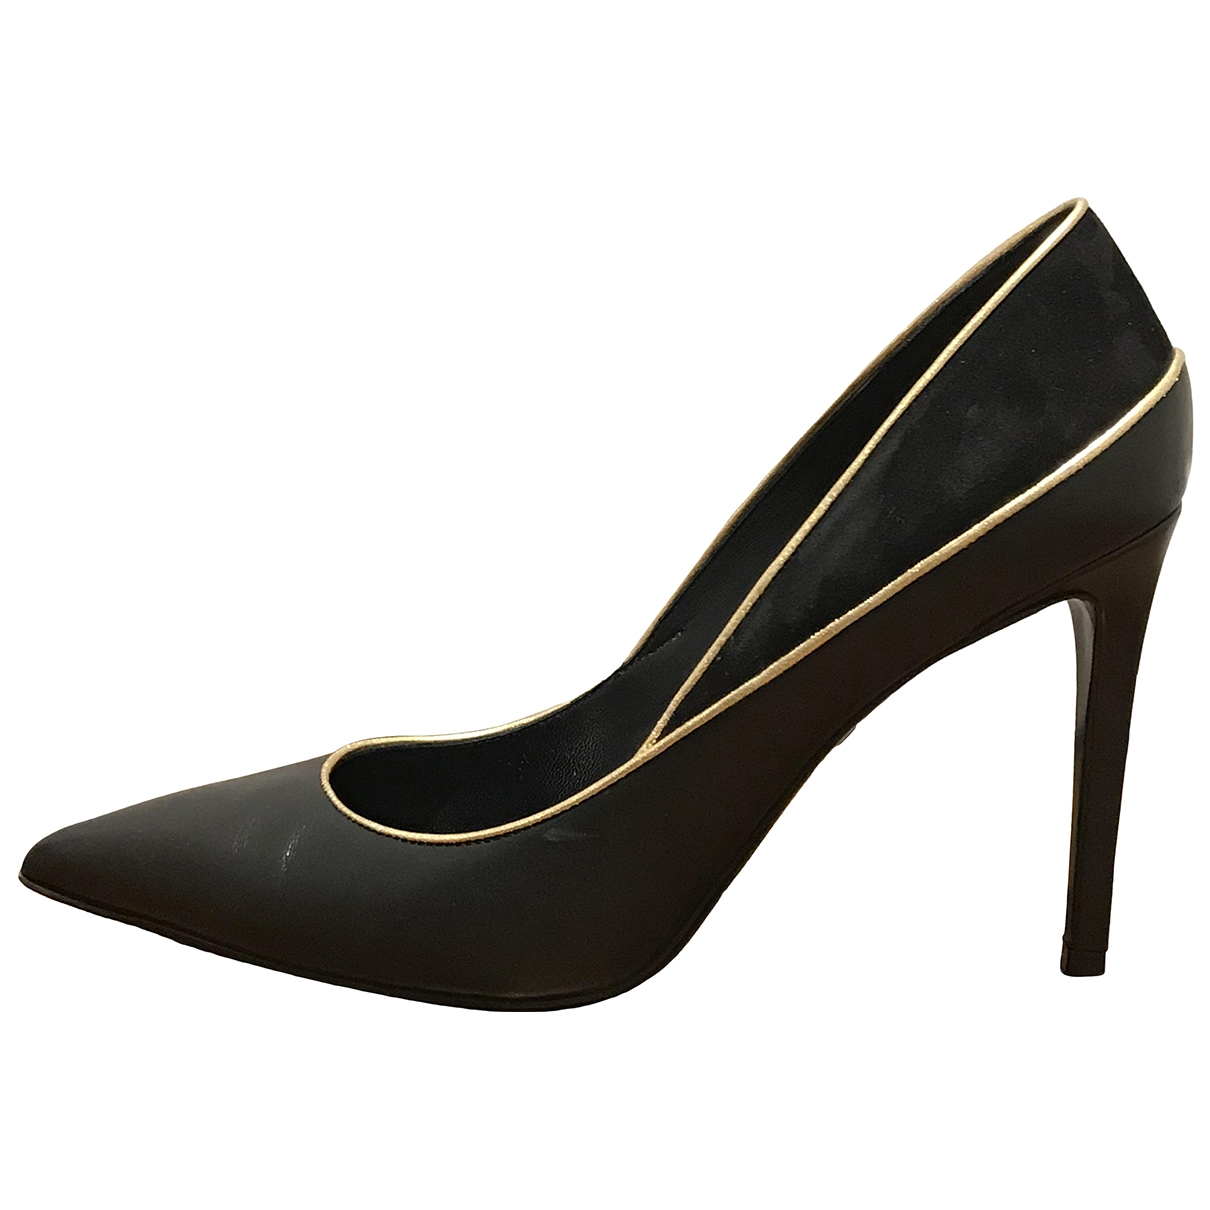 Balmain \N Black Leather Heels for Women 39 EU